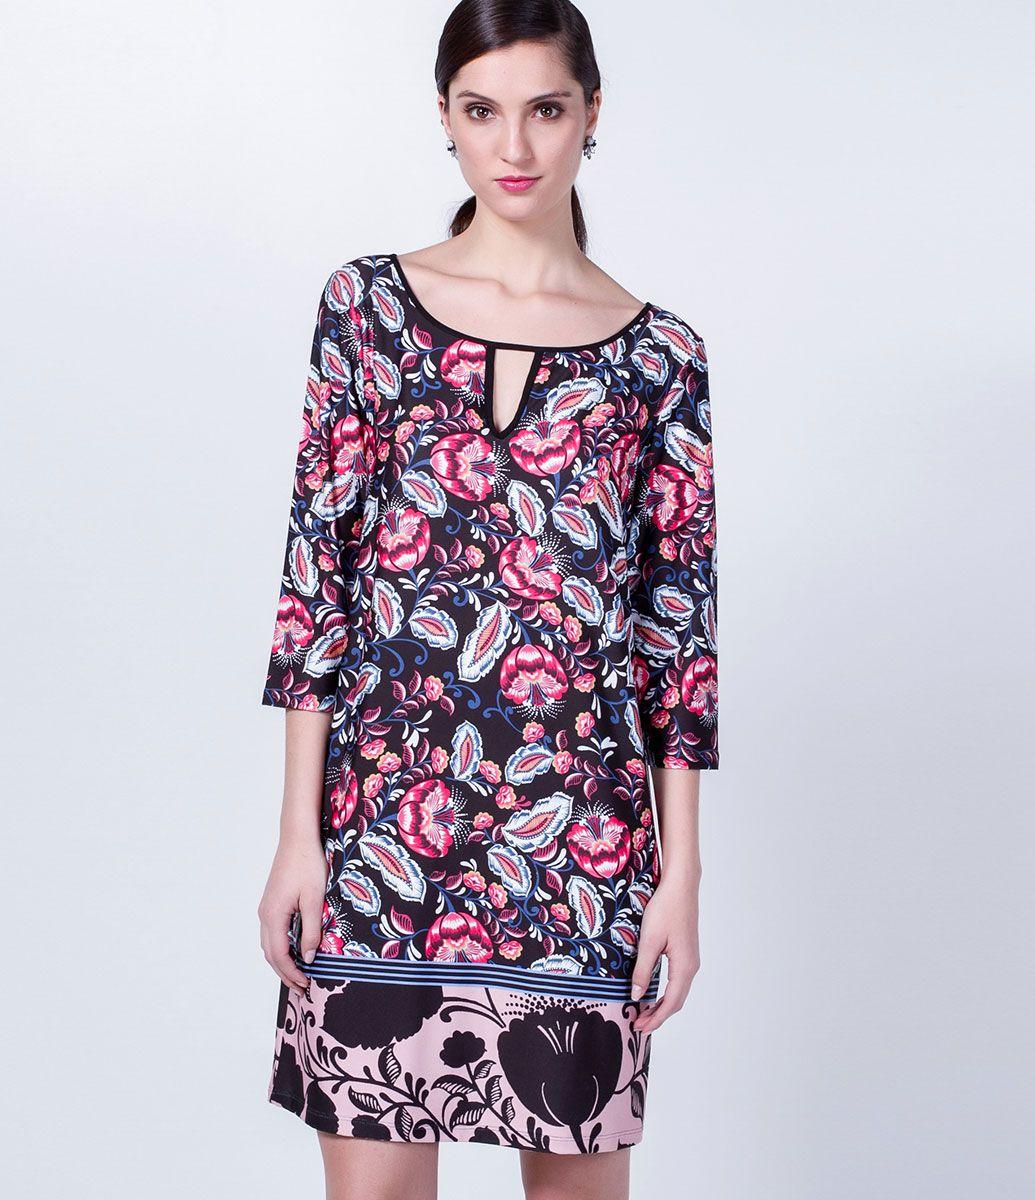 Vestido Floral Manga 3/4 - Lojas Renner | blusas | Pinterest | Blusas